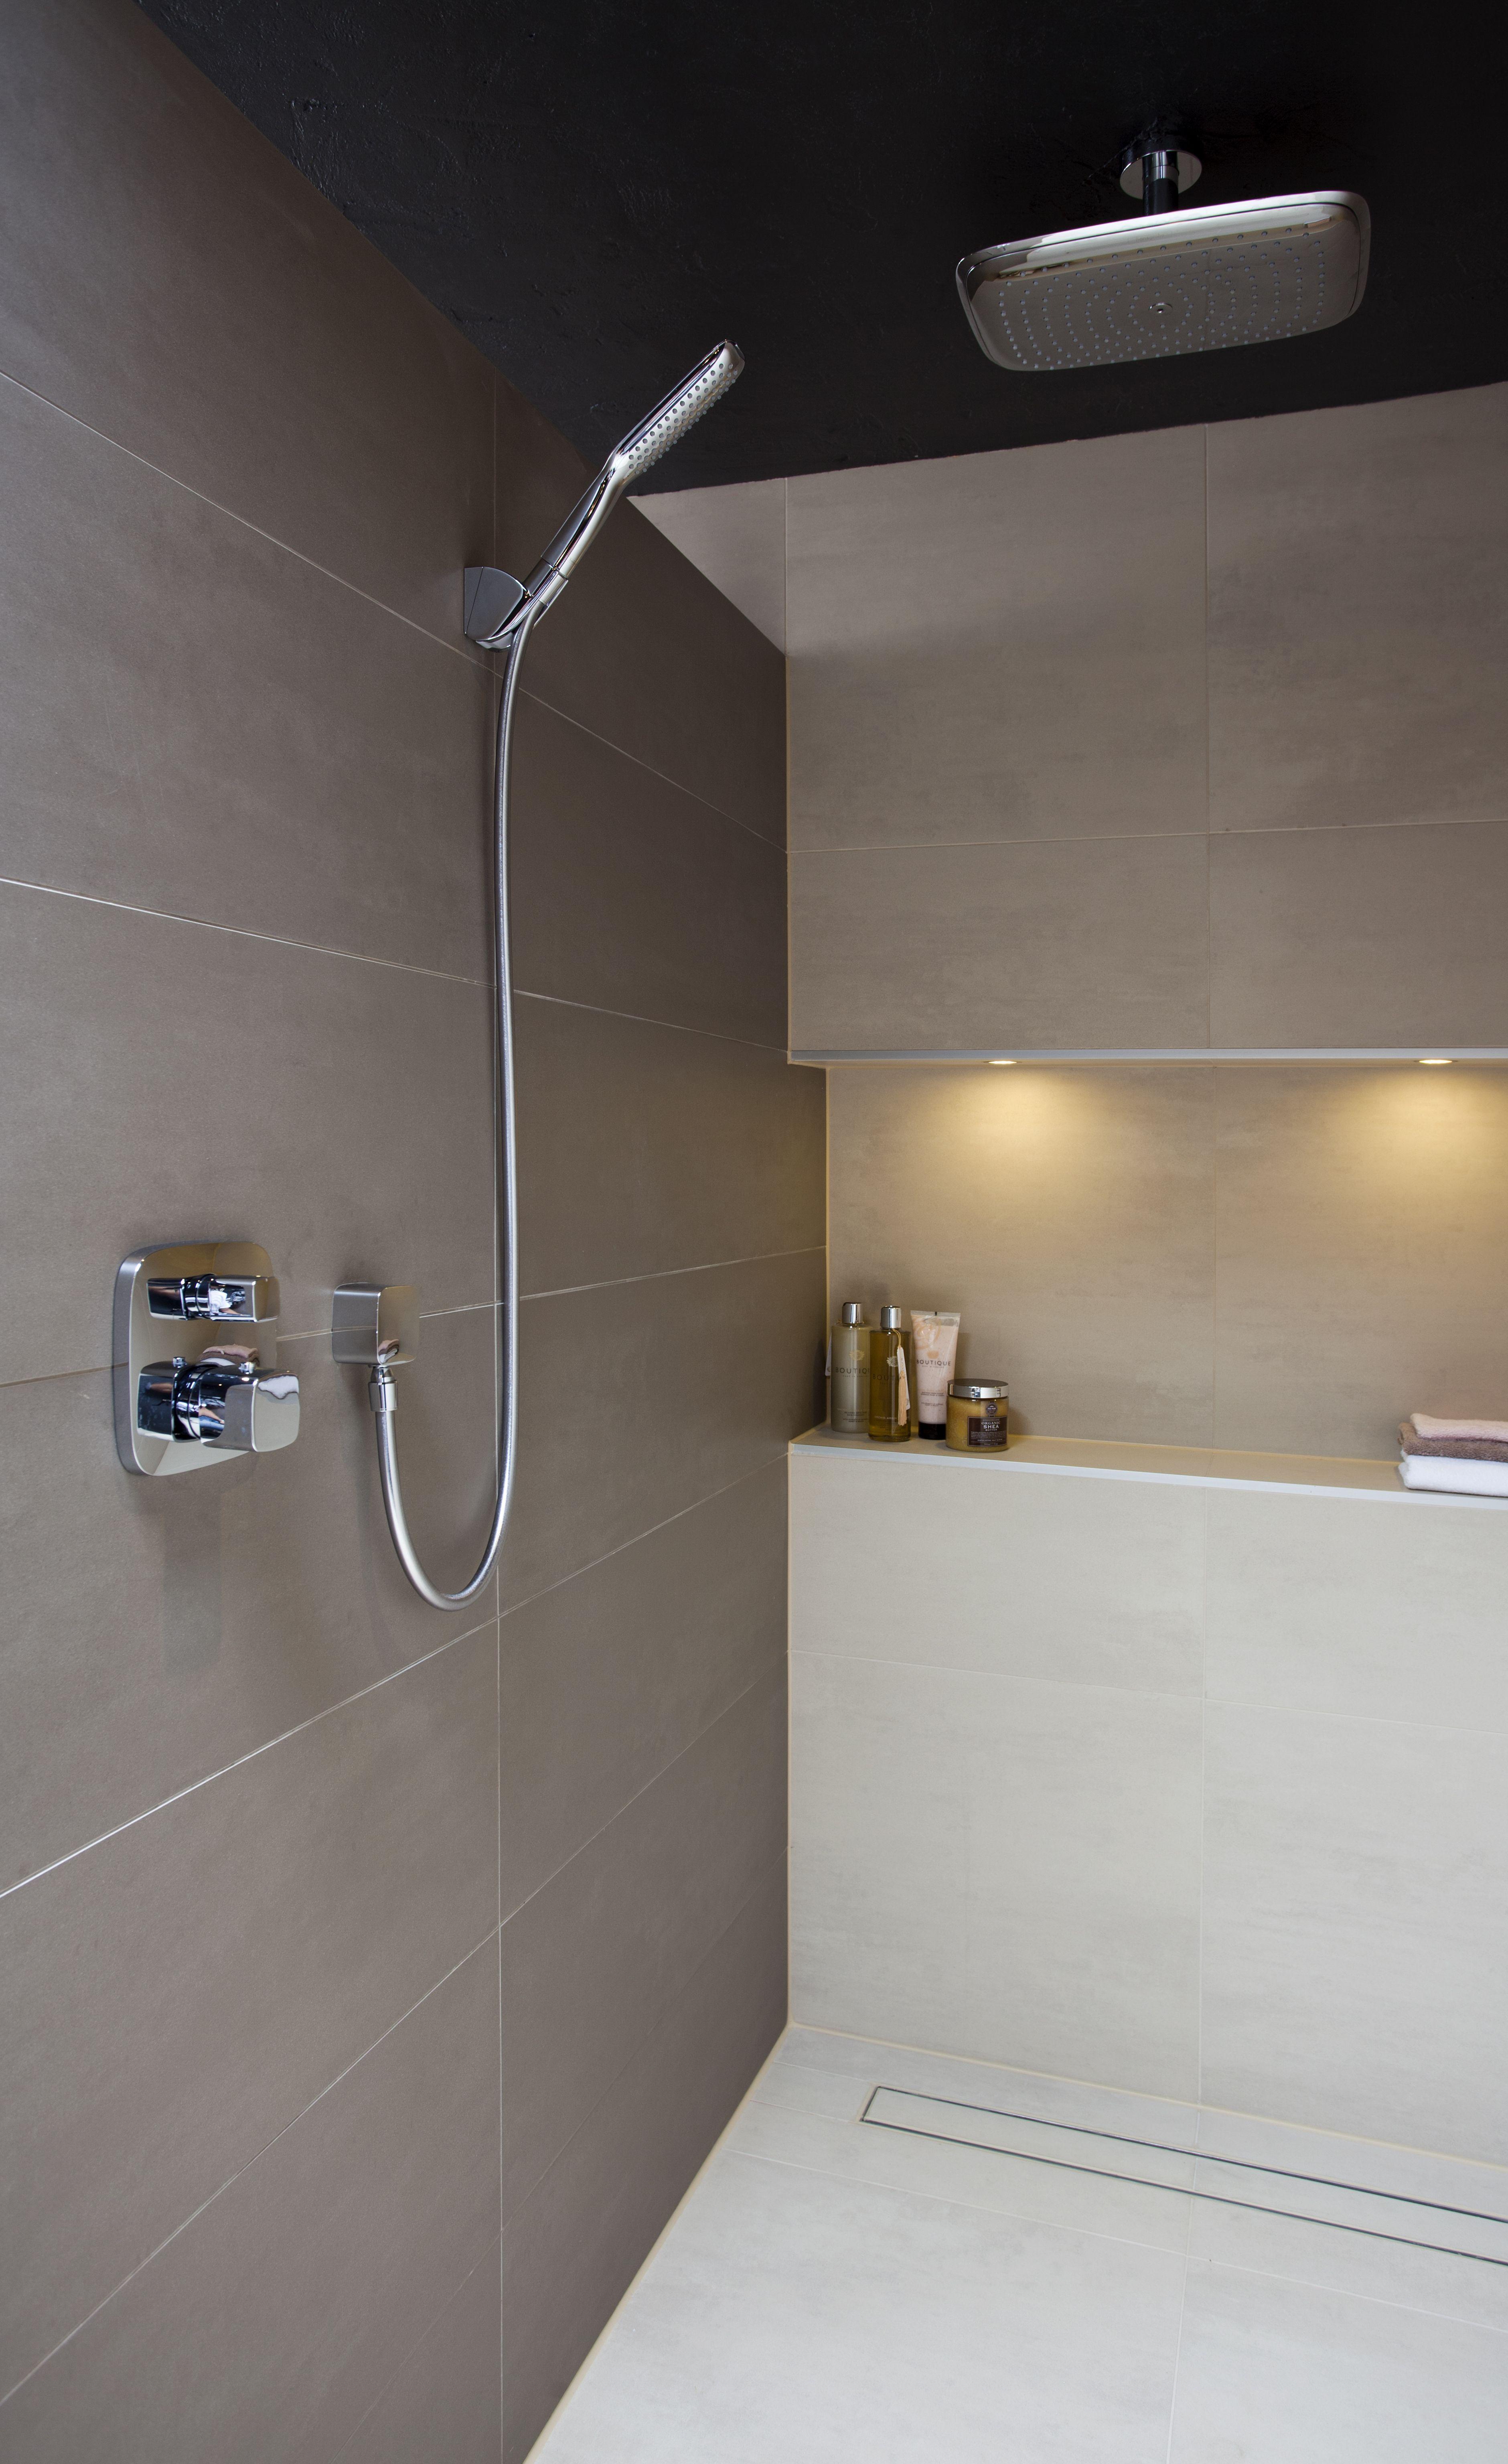 55 Bathroom Lighting Ideas For Every Design Style Trendy